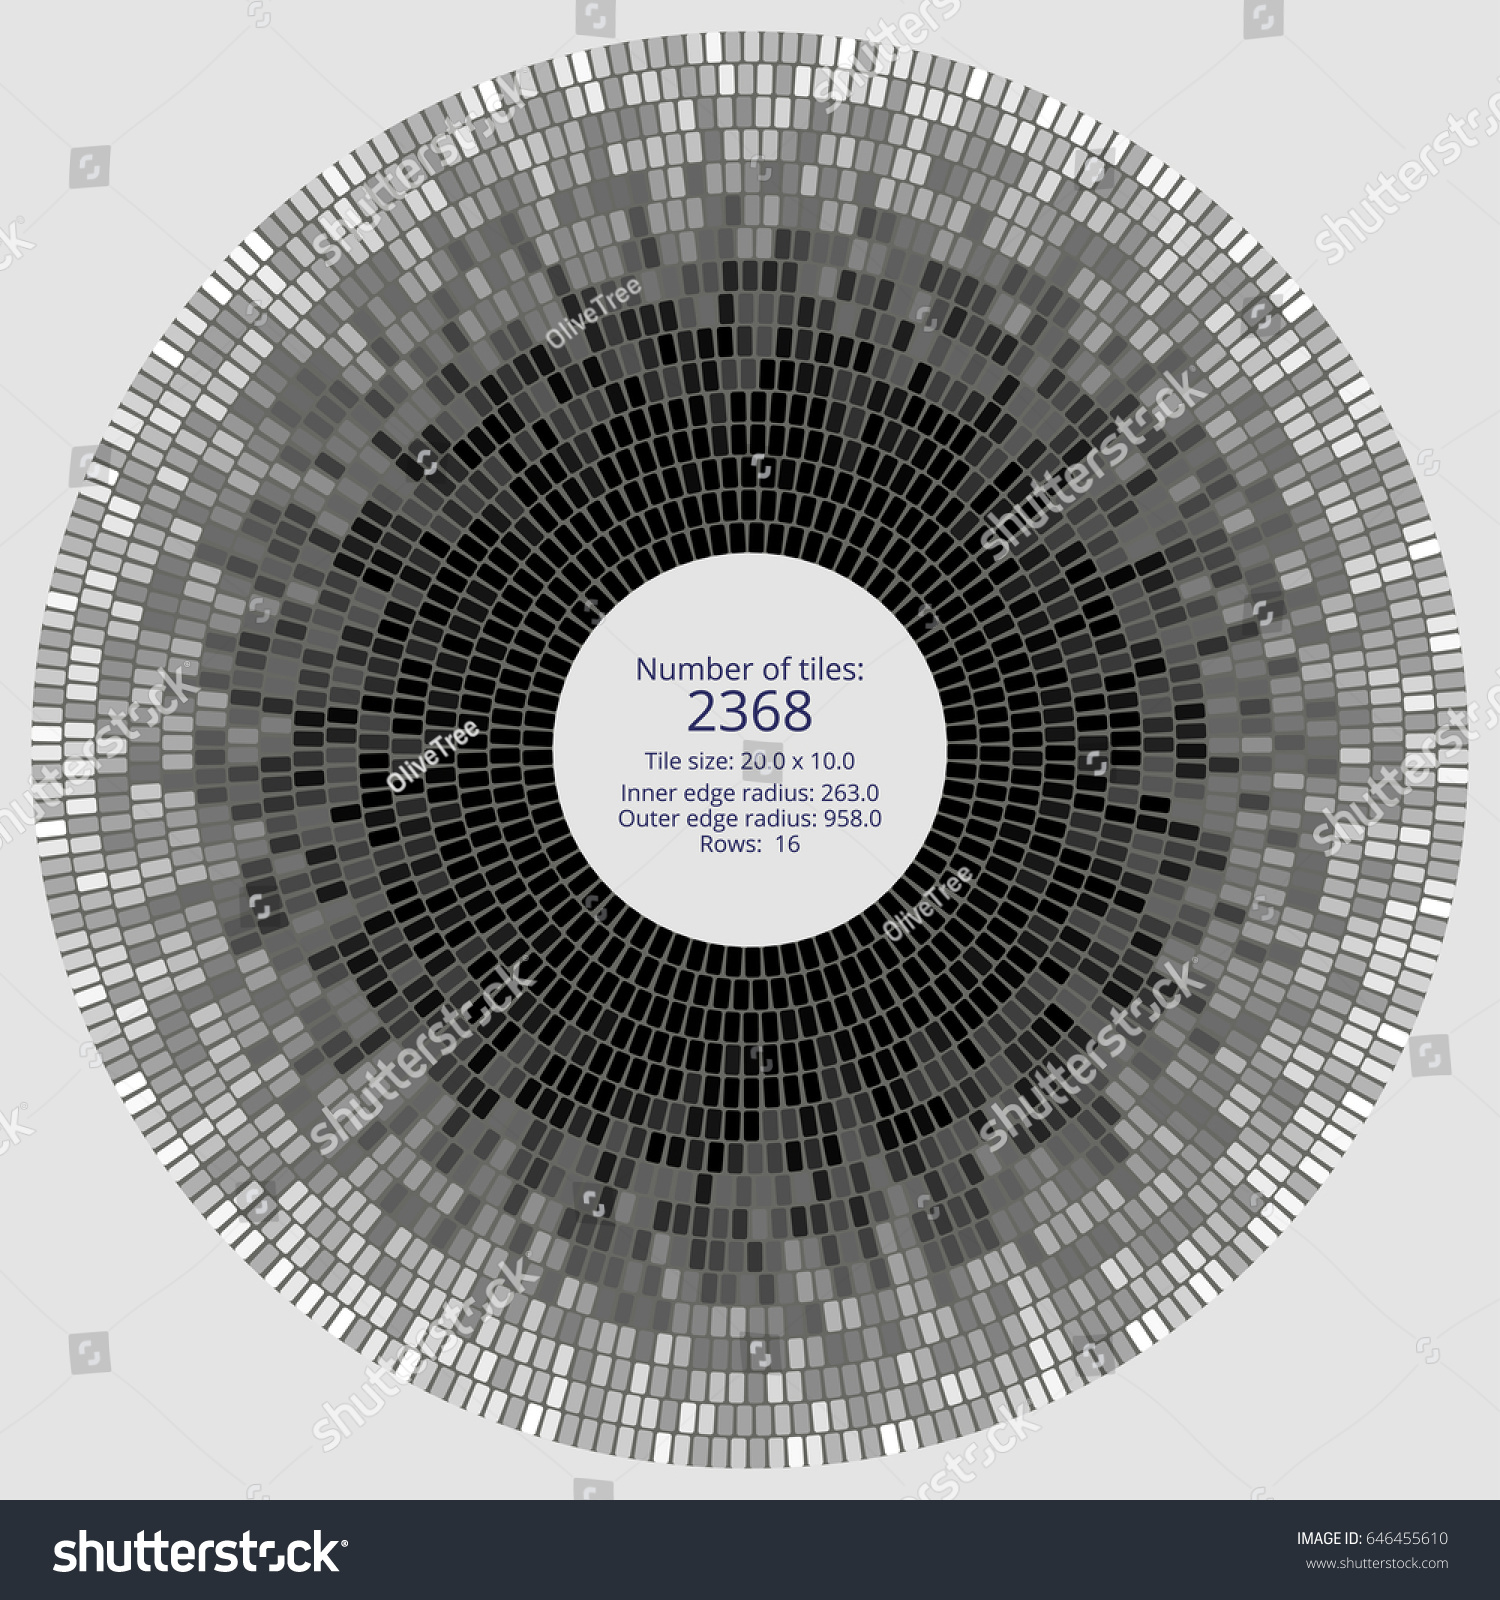 Circular Paving Tile Pattern Quantitative Dimensional